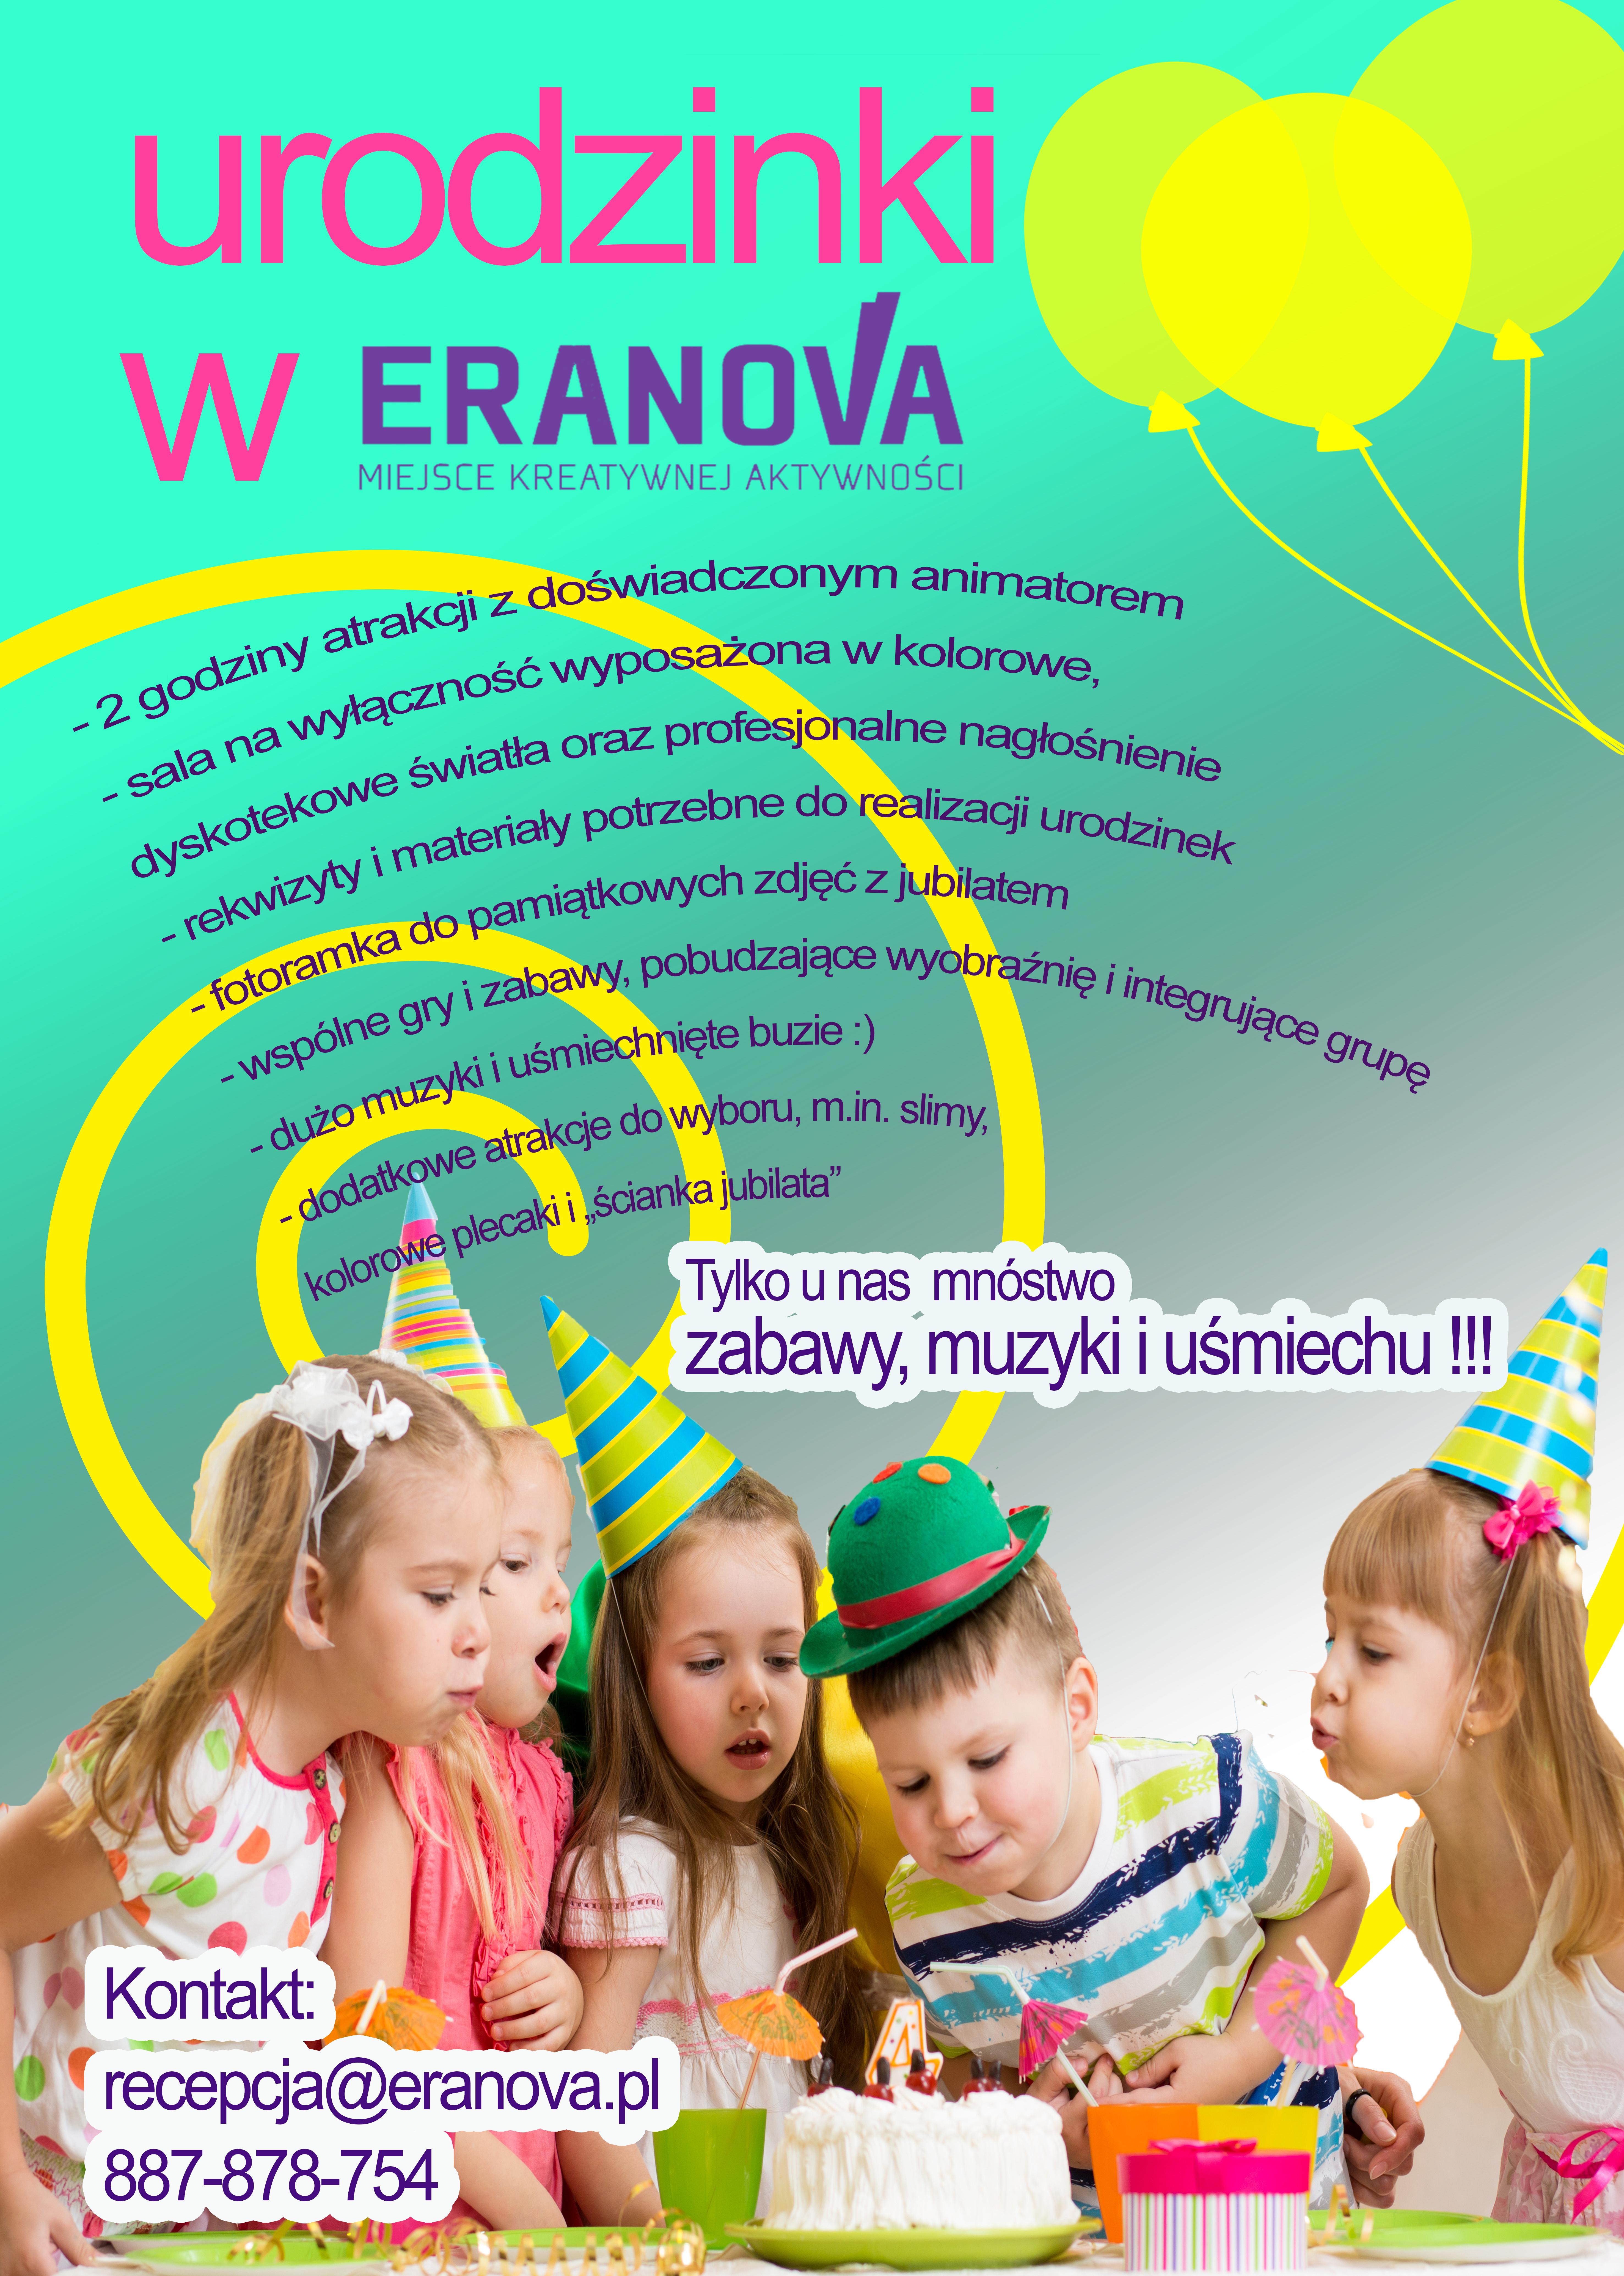 http://m.eranova.pl/2020/10/orig/plakat-urodzinki-3404.jpg